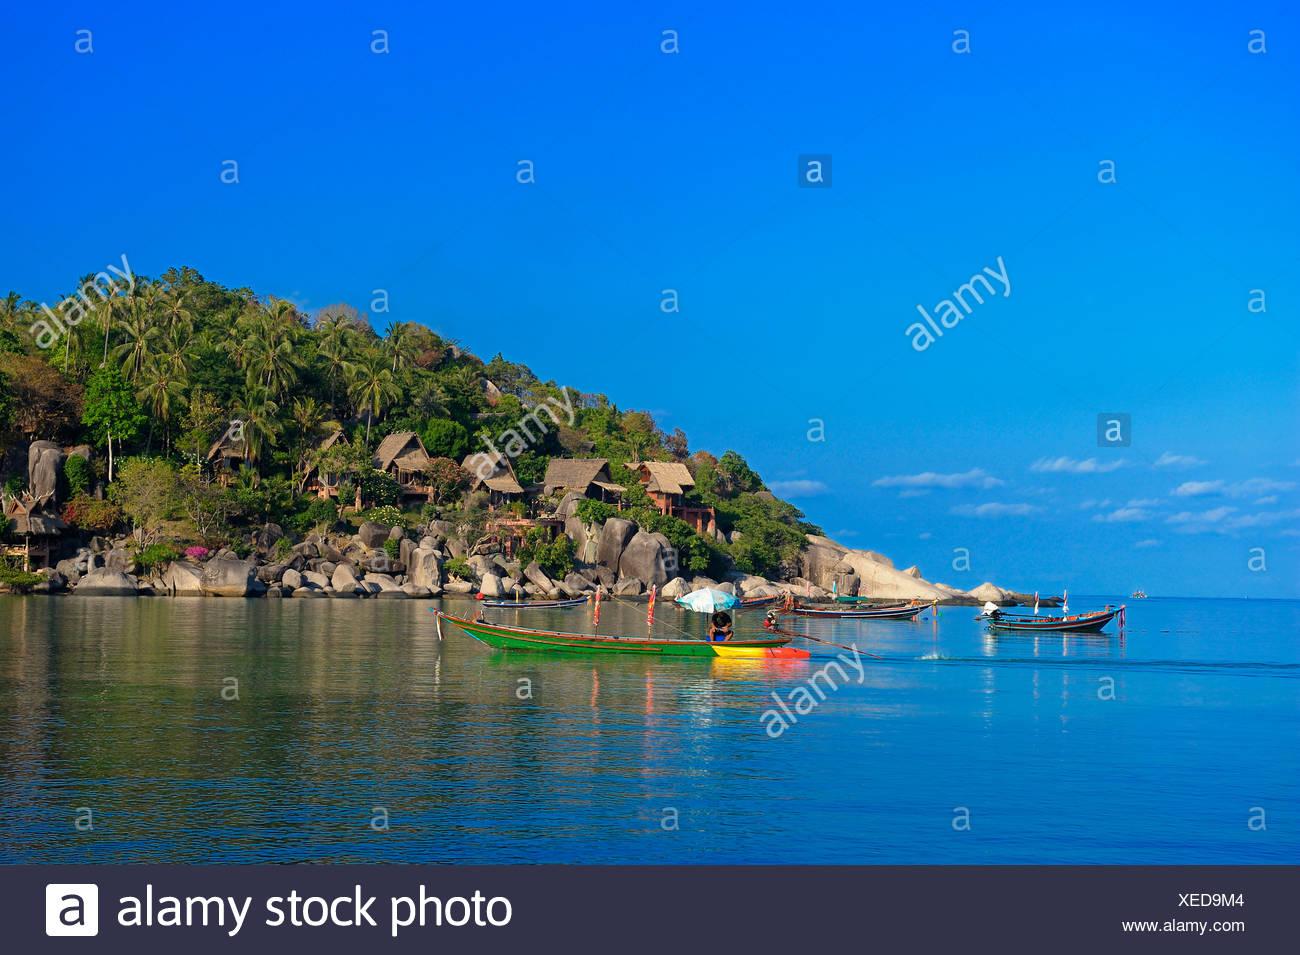 Boats, Sai Ree, Beach, Koh Tao, Thailand, Asia, Stock Photo